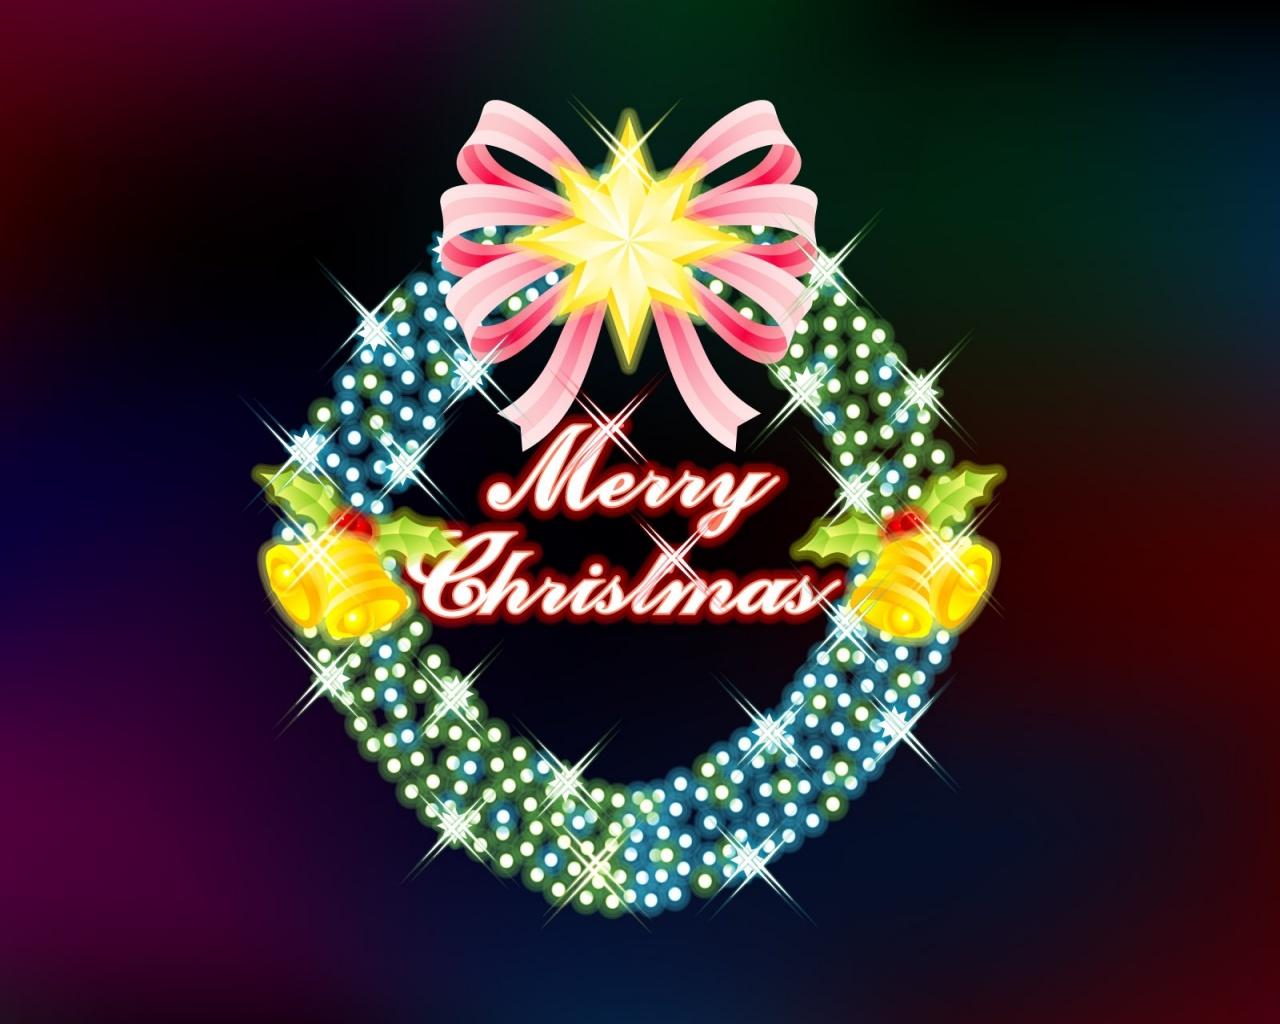 1280x1024 Merry Christmas desktop PC and Mac wallpaper 1280x1024